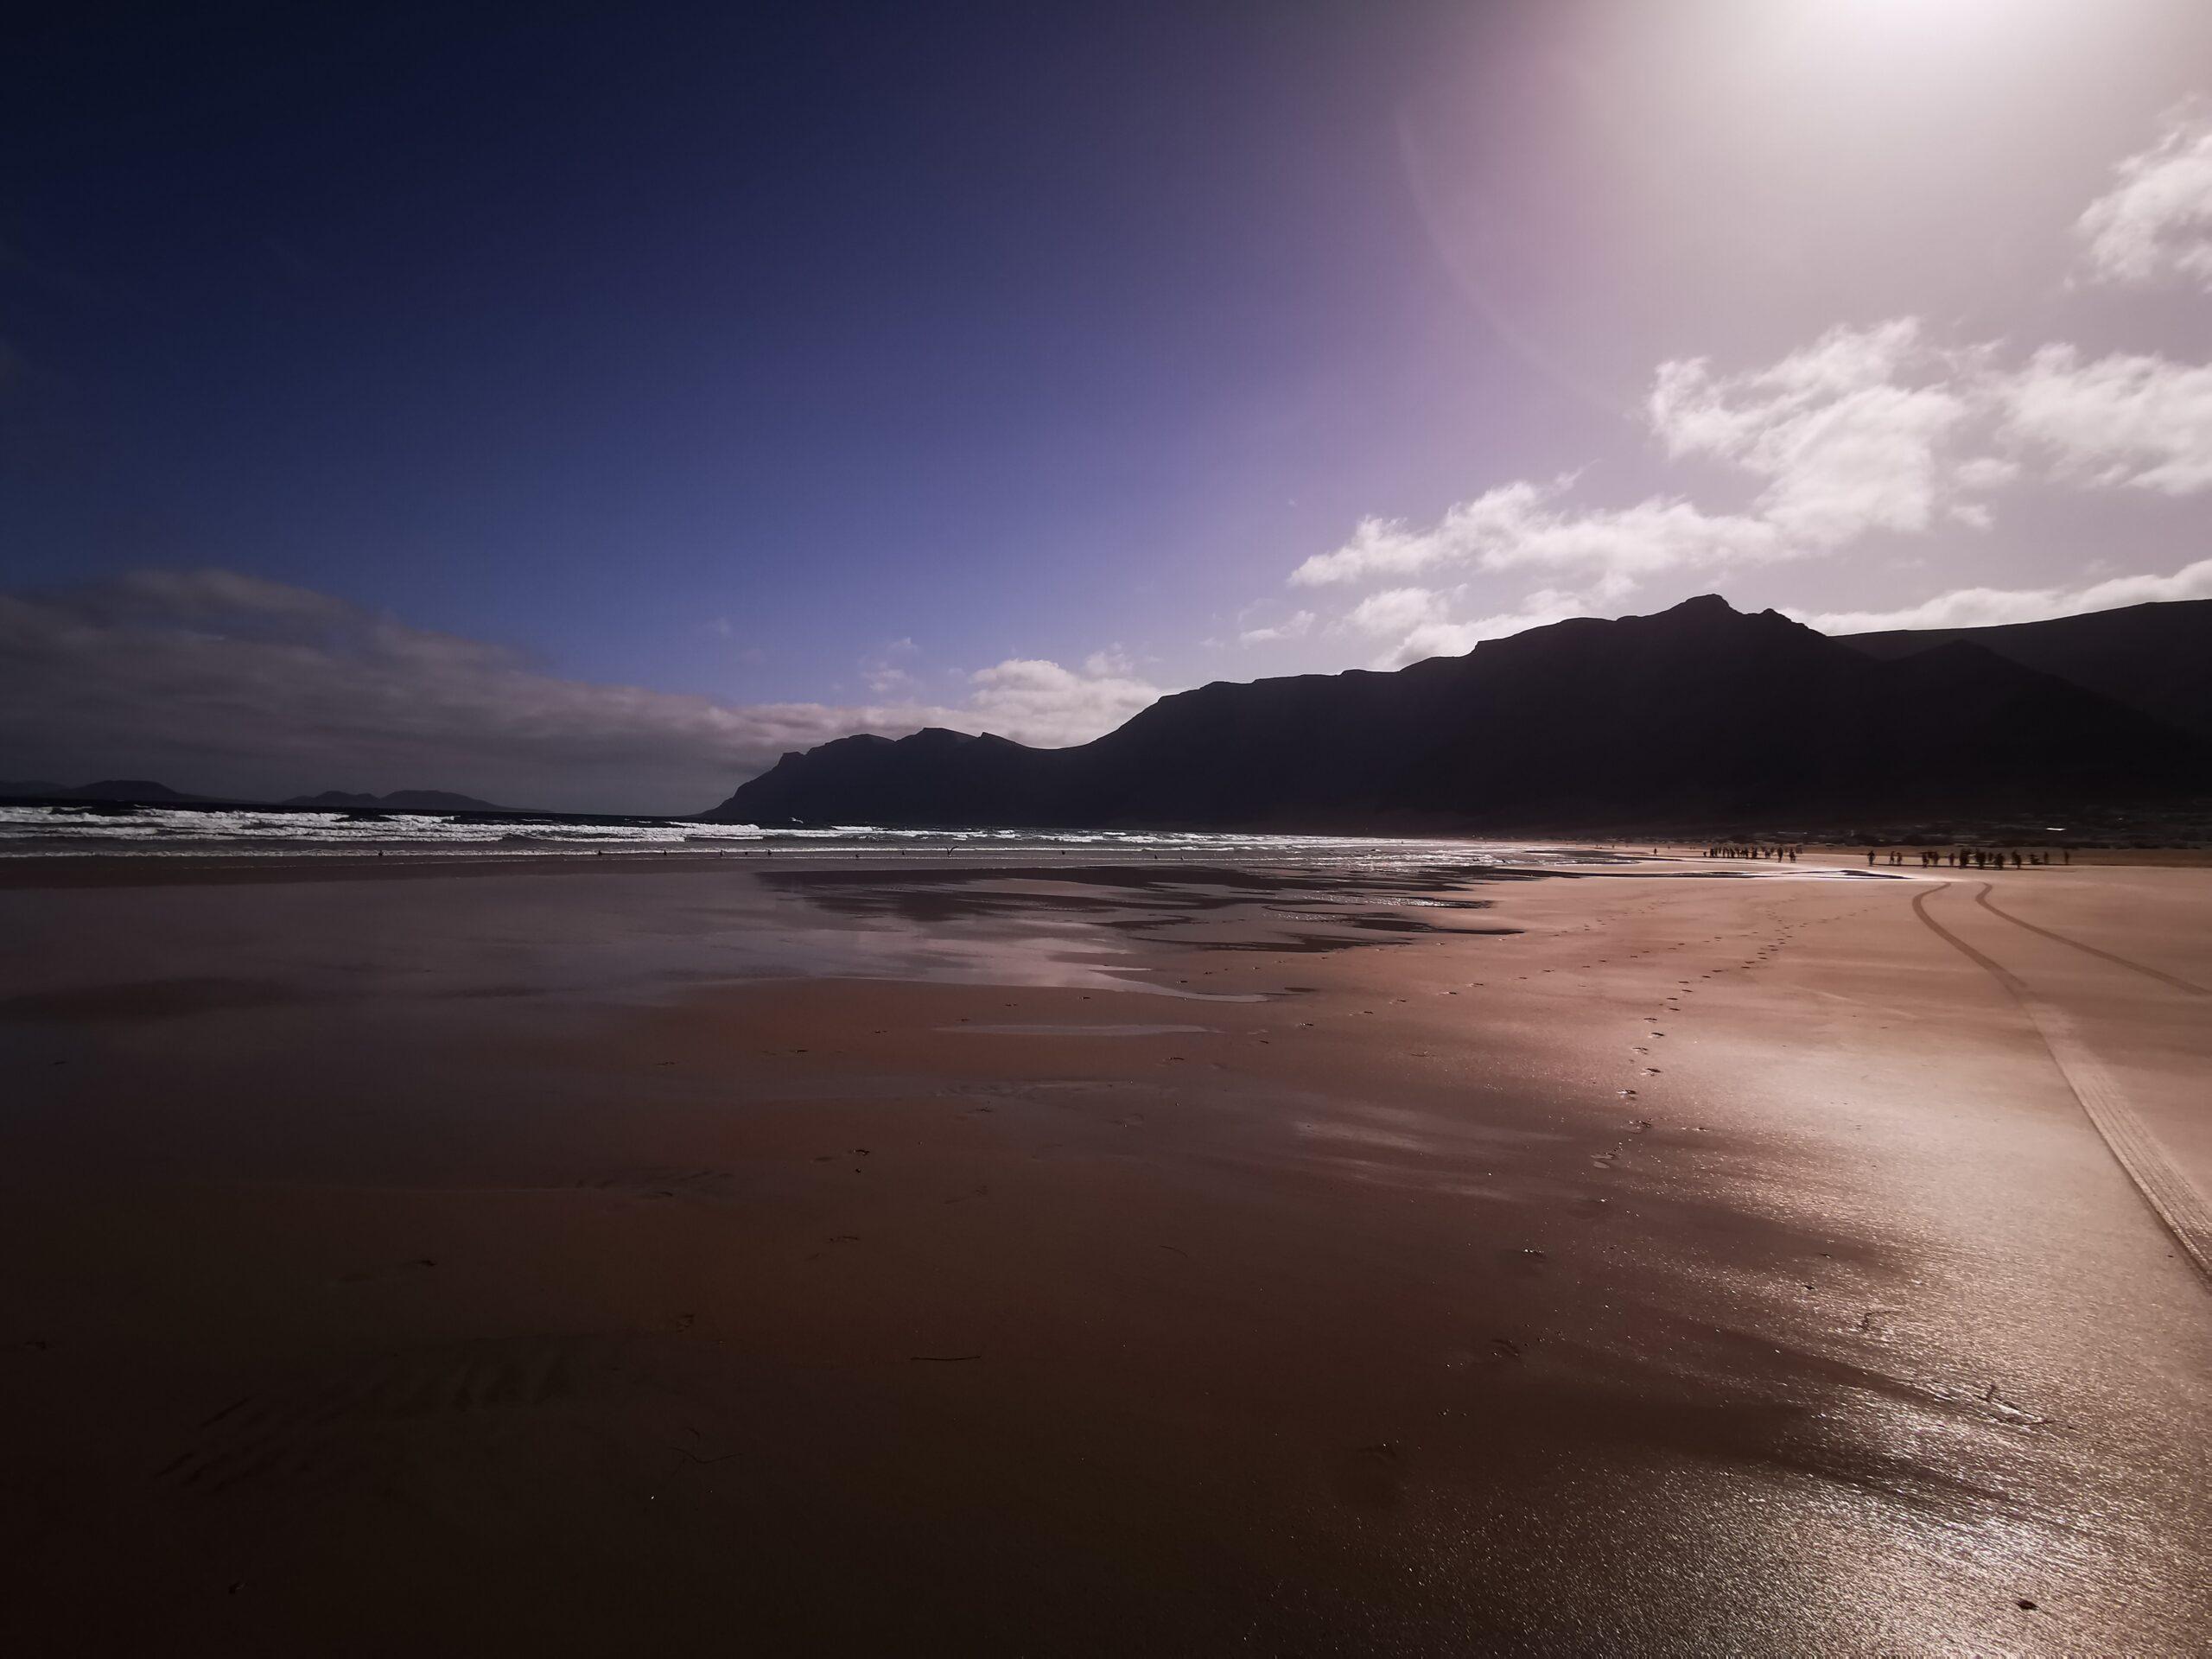 Lanzarote Famara Strand Sonnenaufgang Ozeanien Tours